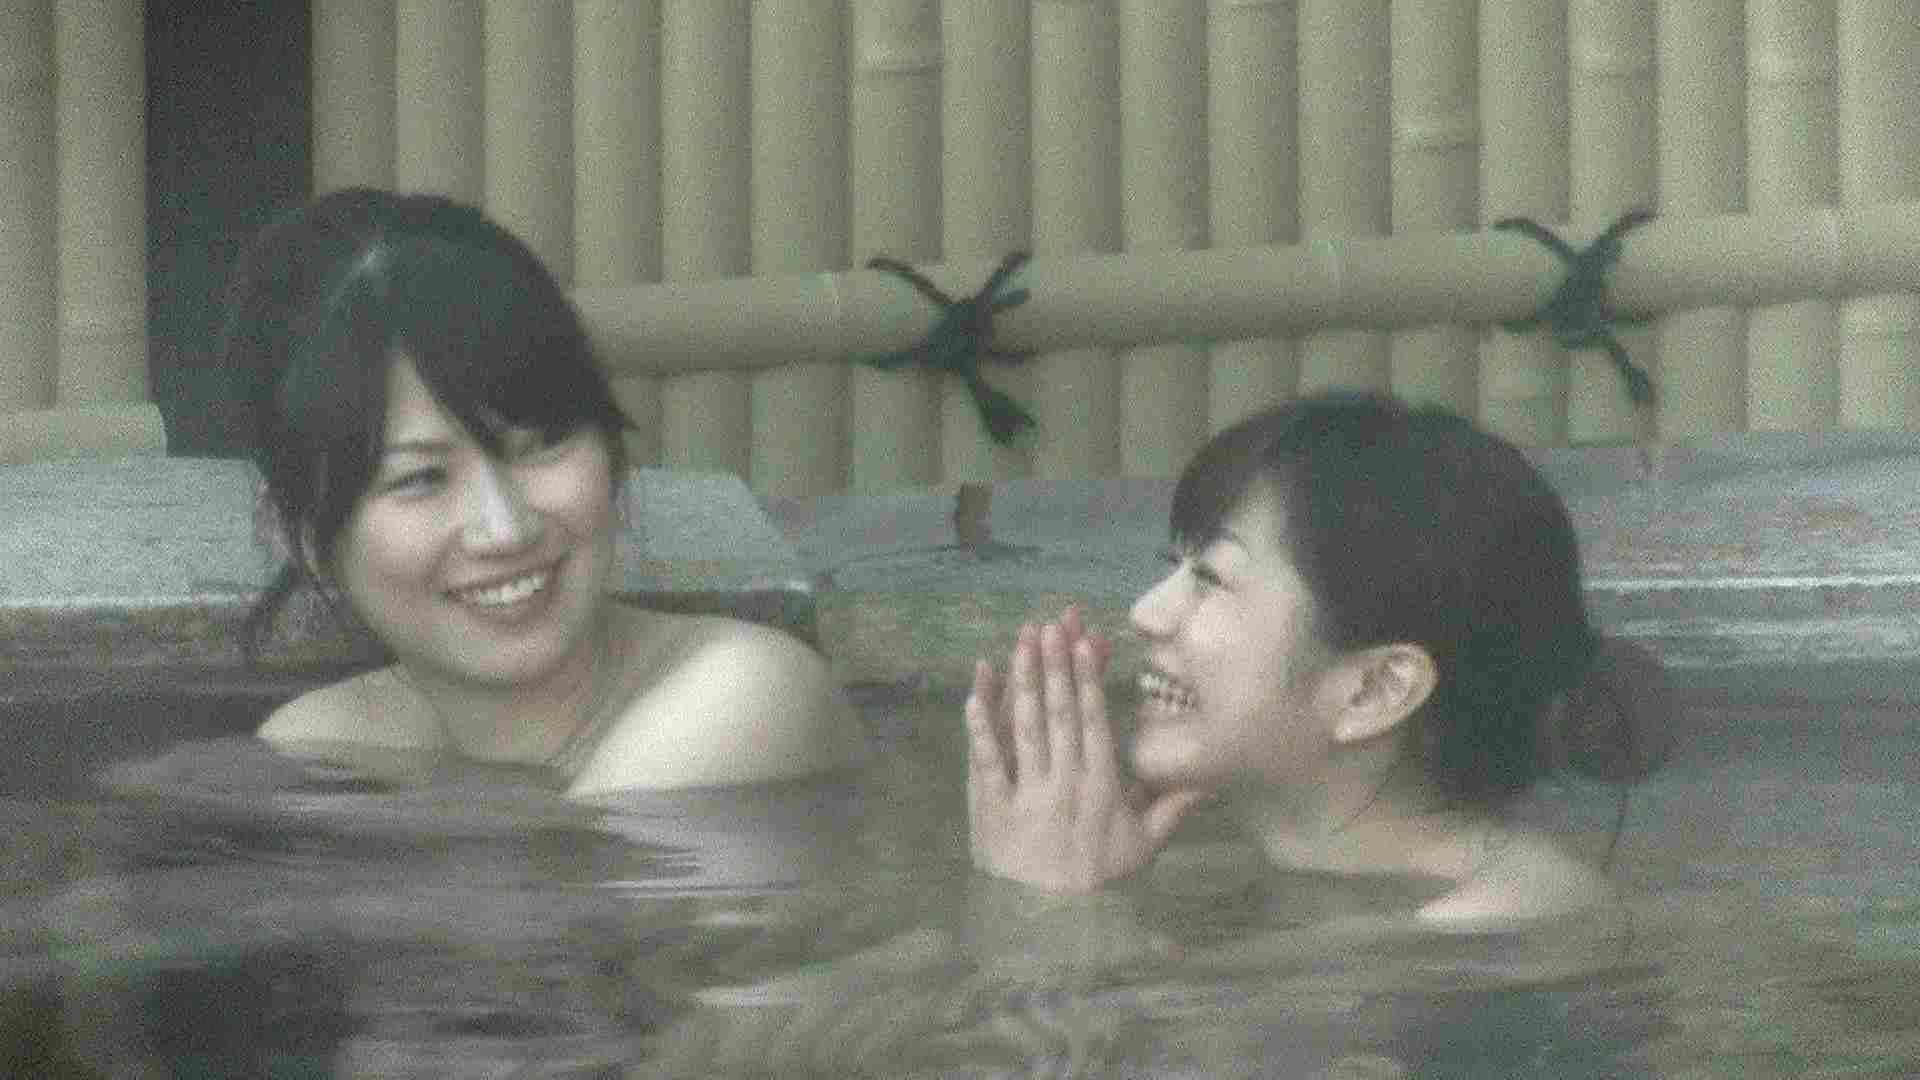 Aquaな露天風呂Vol.206 露天 | HなOL  74pic 19